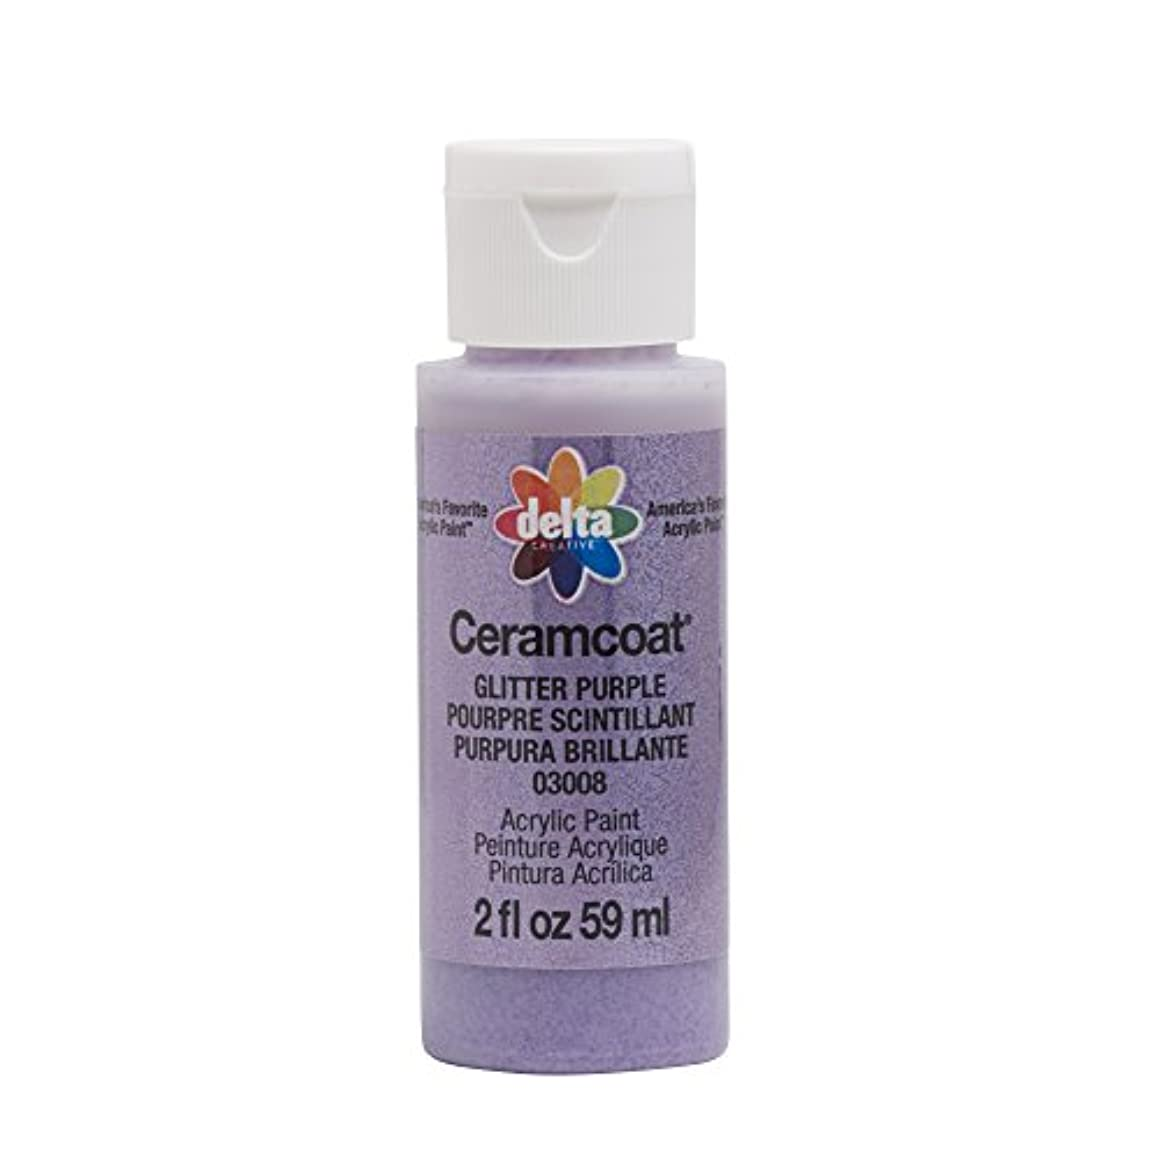 Delta Creative 03008 Ceramcoat 2oz Glitter Purple Acrylic Paint,